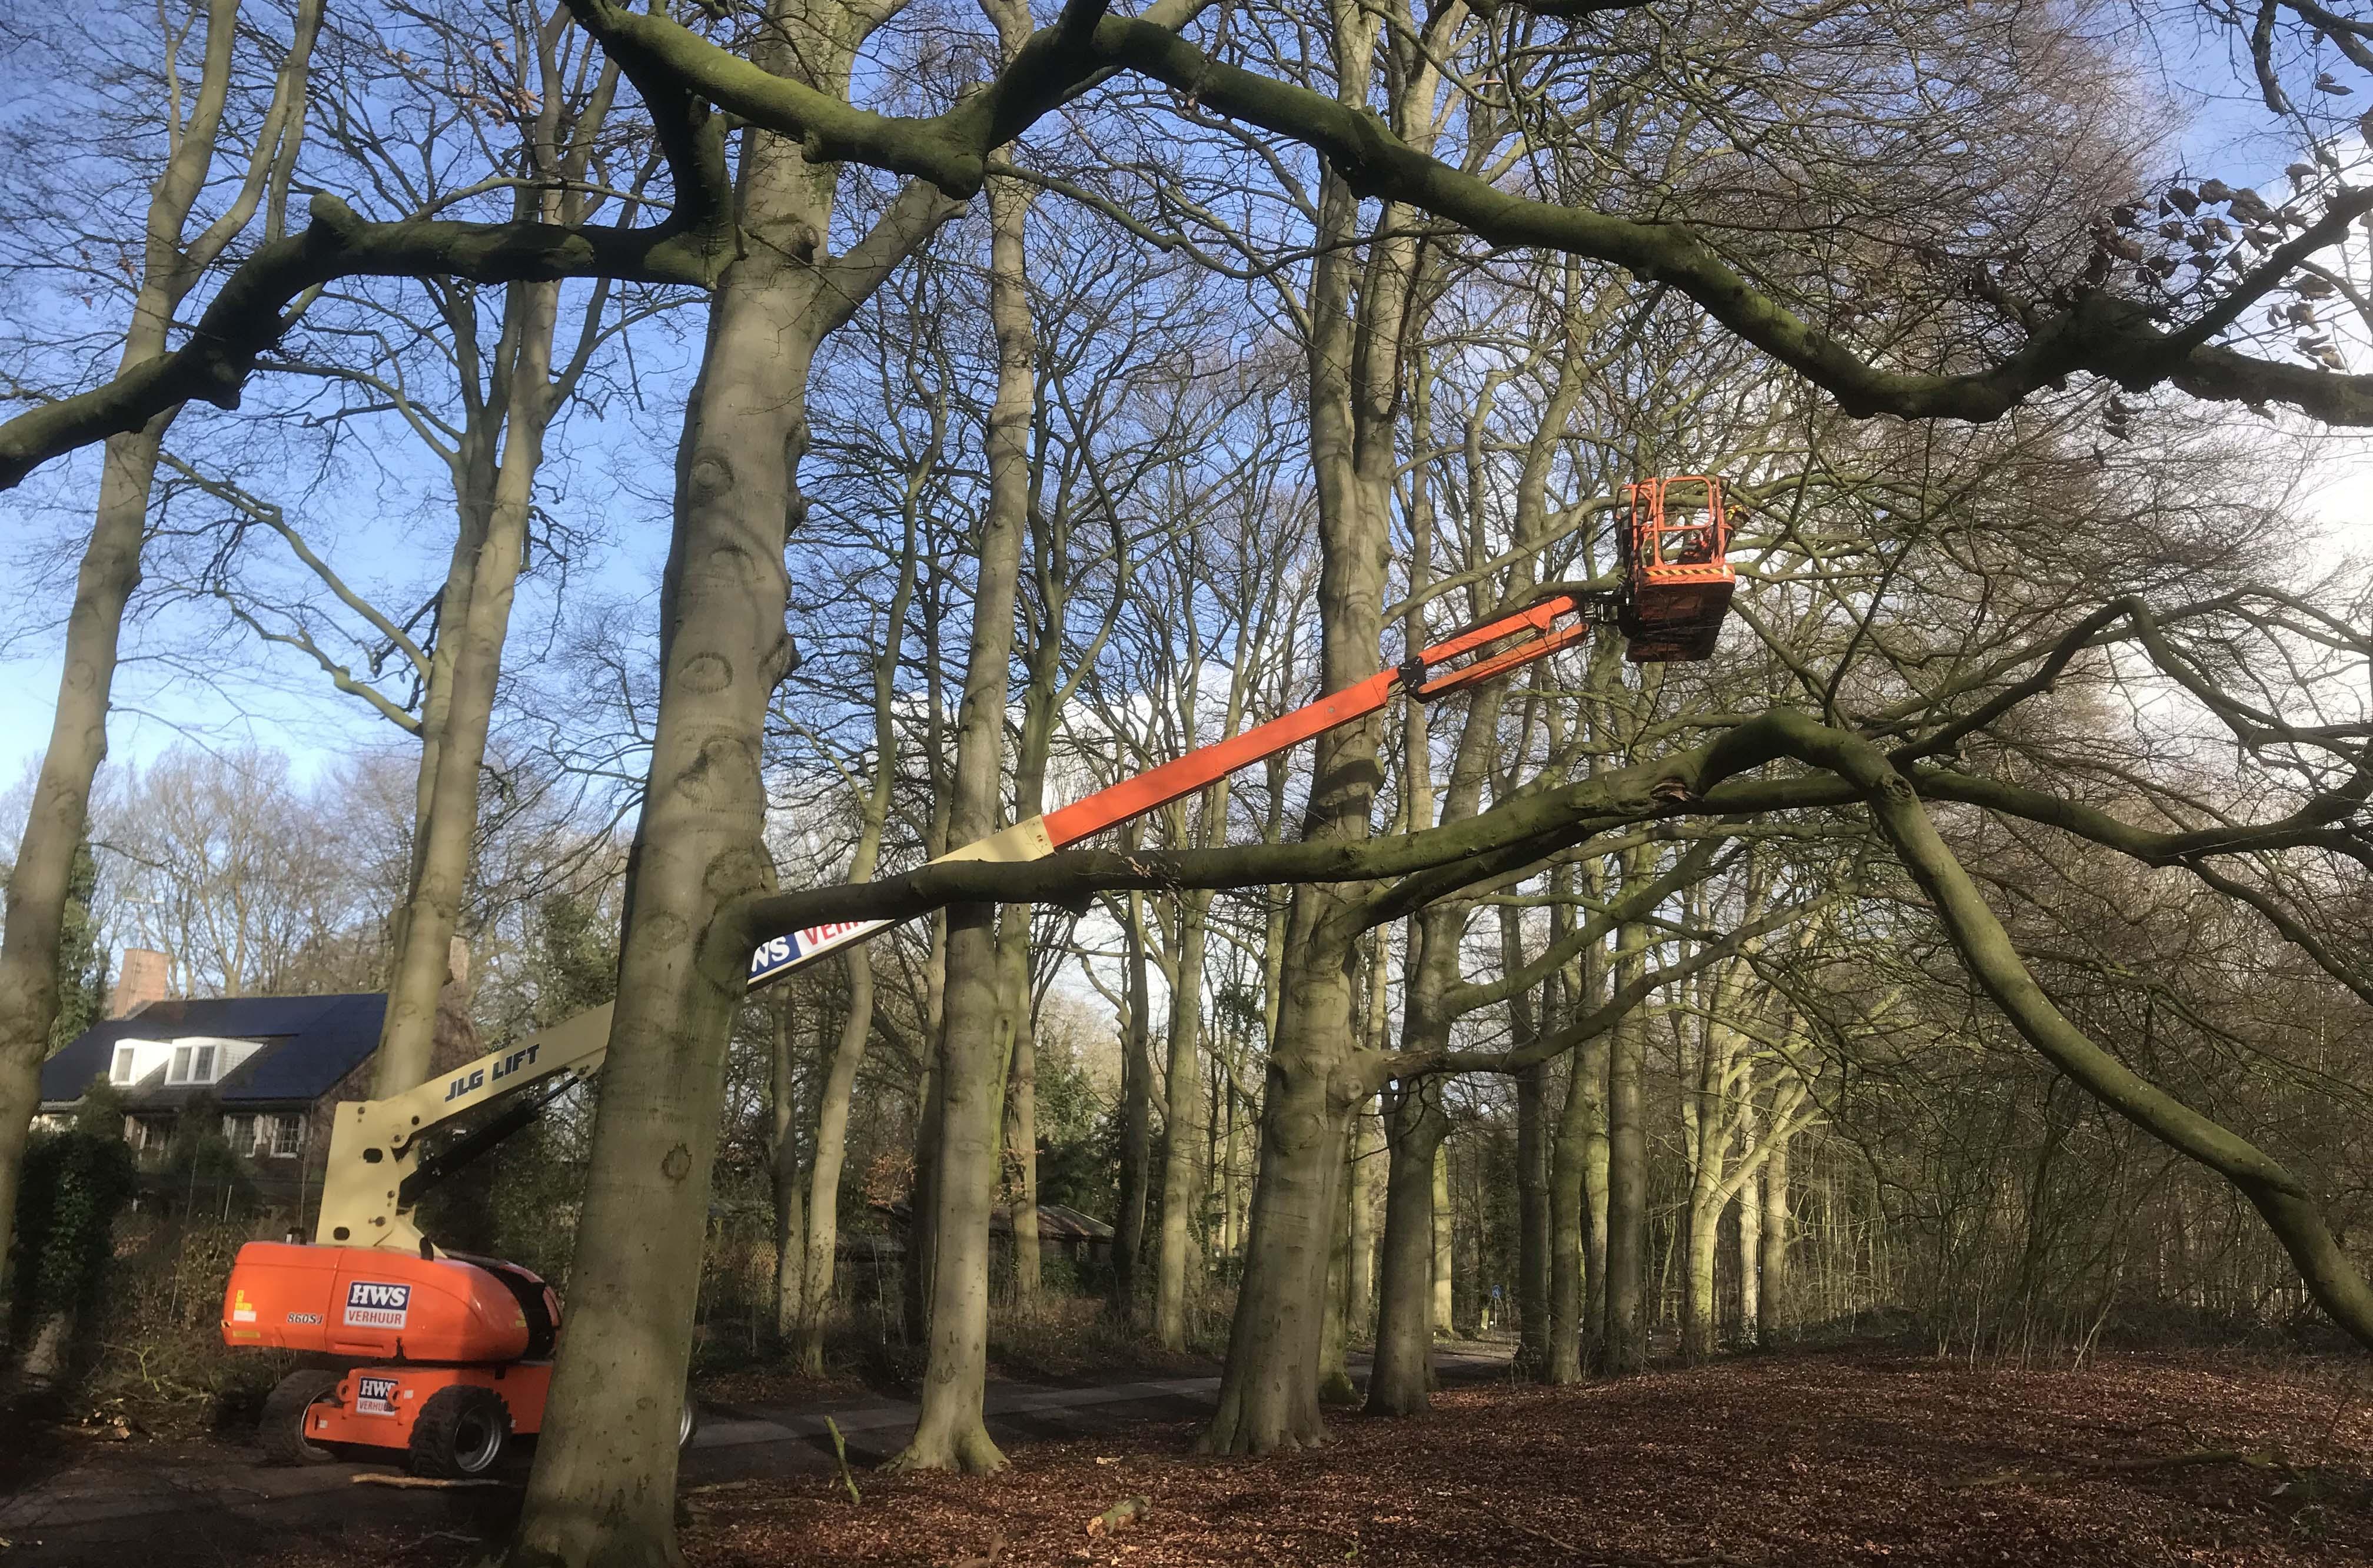 Hoefakker boomspecialisten snoeien monumentale beuken Geldersch Landschap (3m)